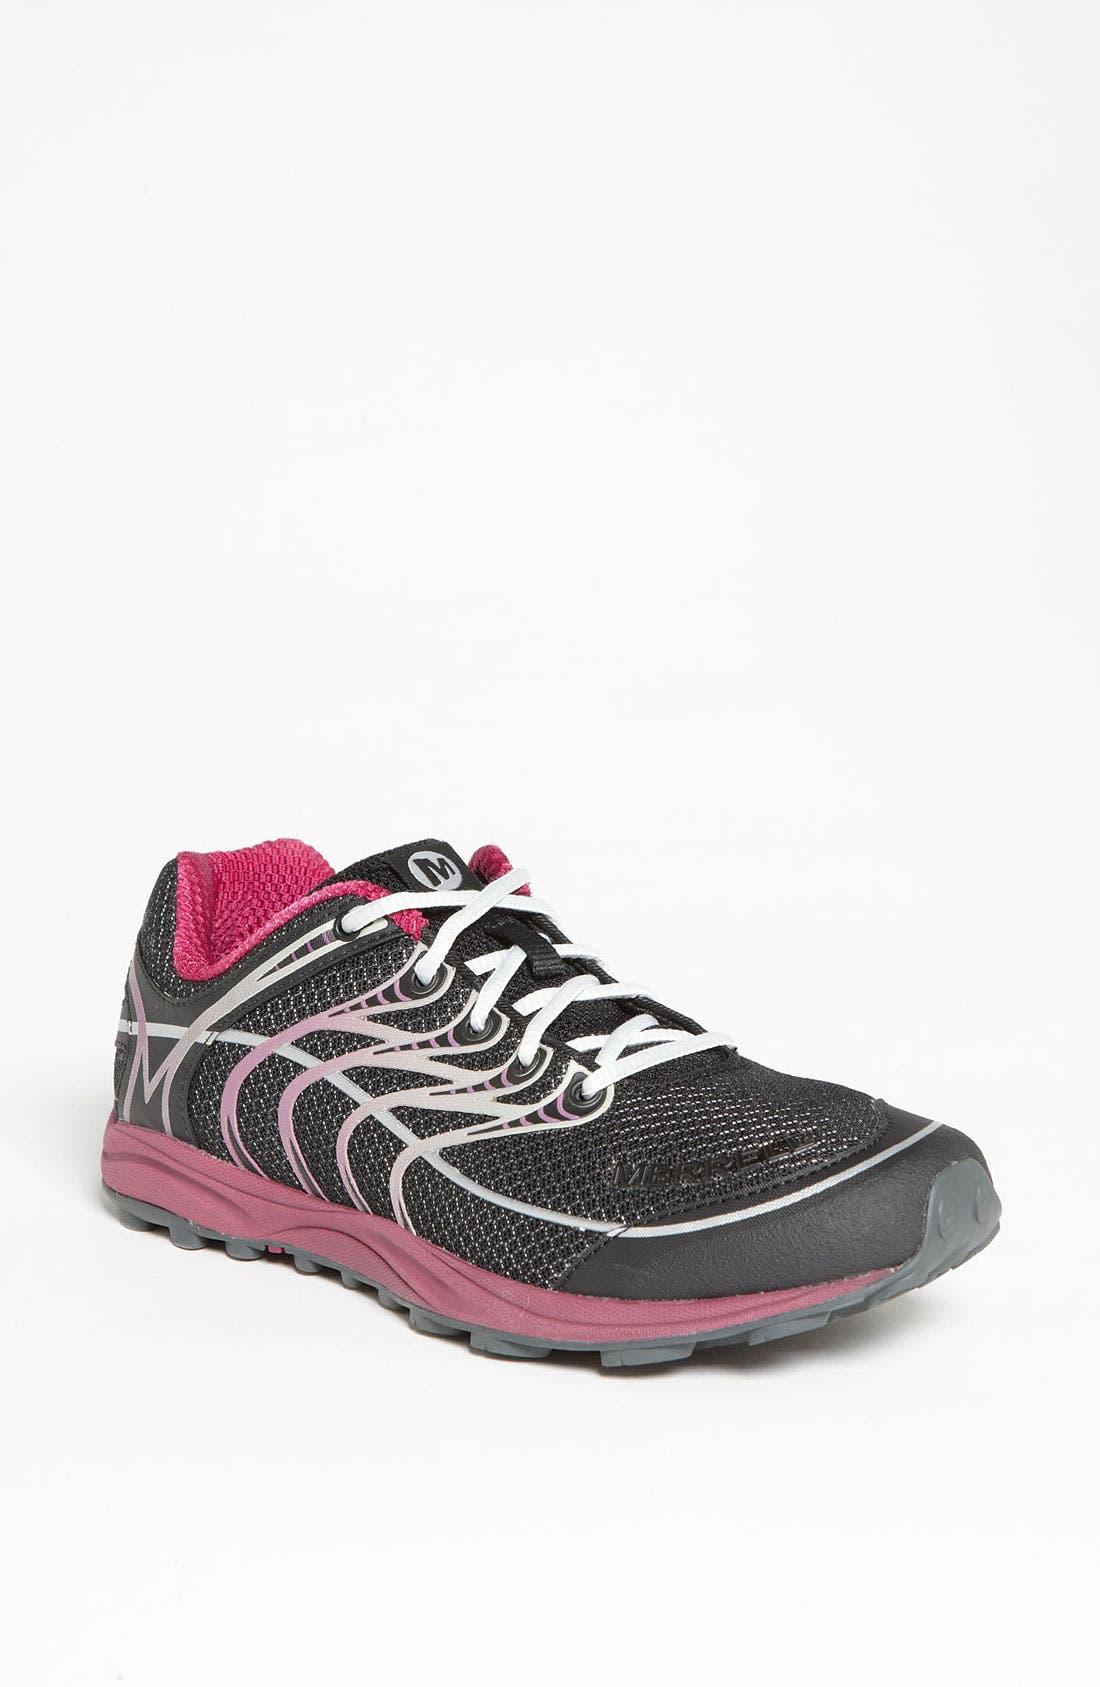 Alternate Image 1 Selected - Merrell 'Mix Master Road Glide' Running Shoe (Women)